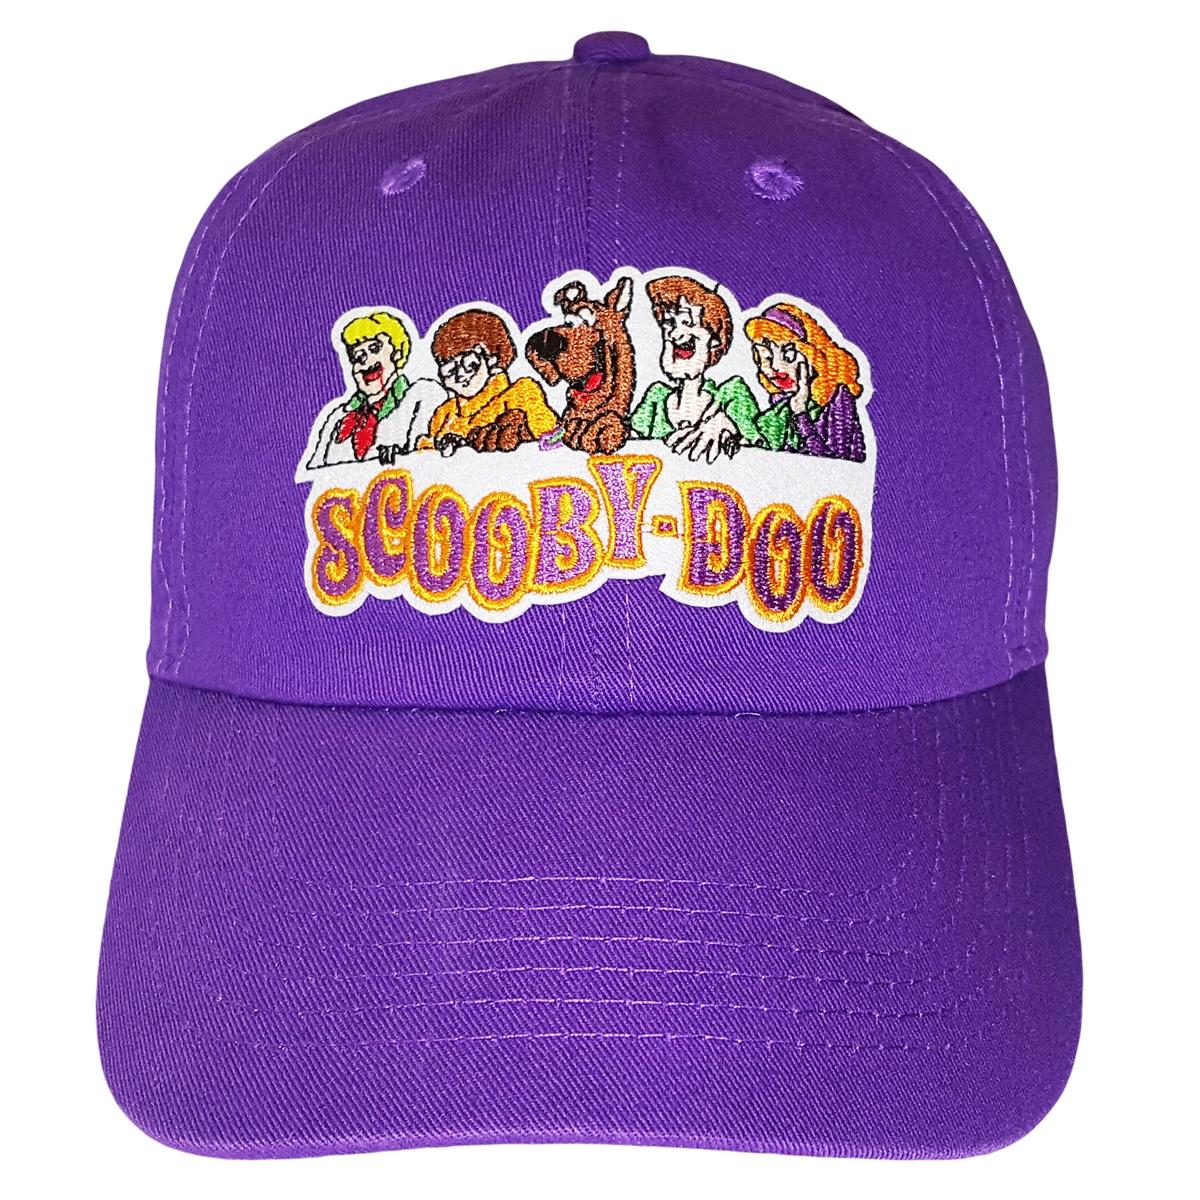 7a6fe6e3ee1 Scooby-Doo Purple Adjustable Dad Hat Strapback Patch